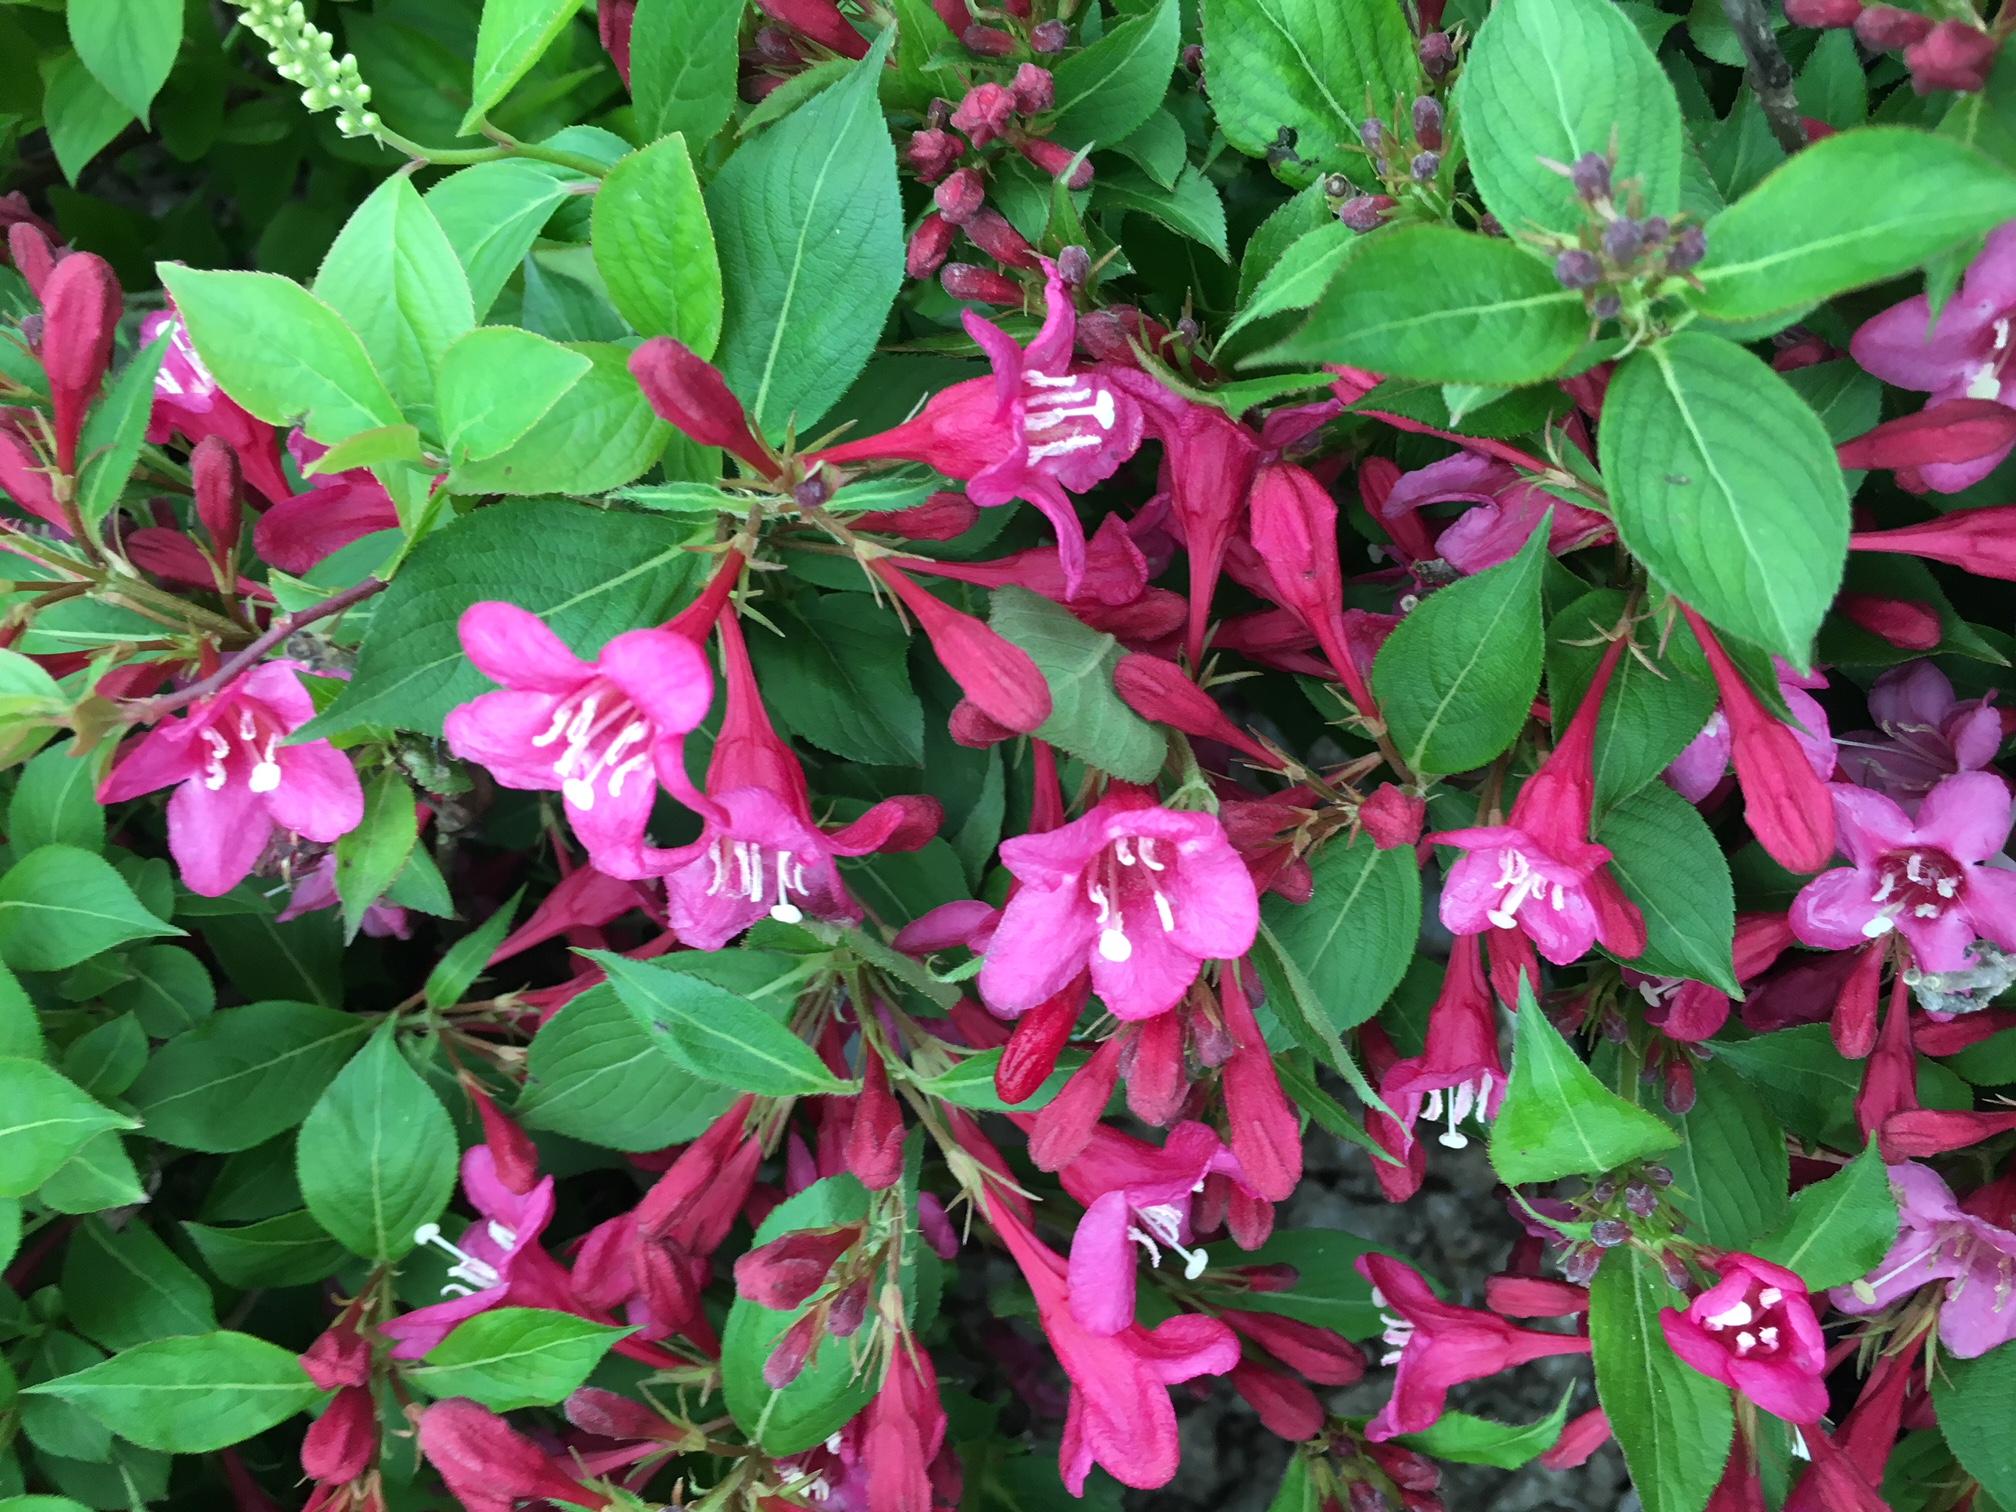 Genial Blooms Through Spring Shrubs Baxter Gardens Sonic Bloom Weigela Reviews Sonic Bloom Weigela Colors houzz-03 Sonic Bloom Weigela